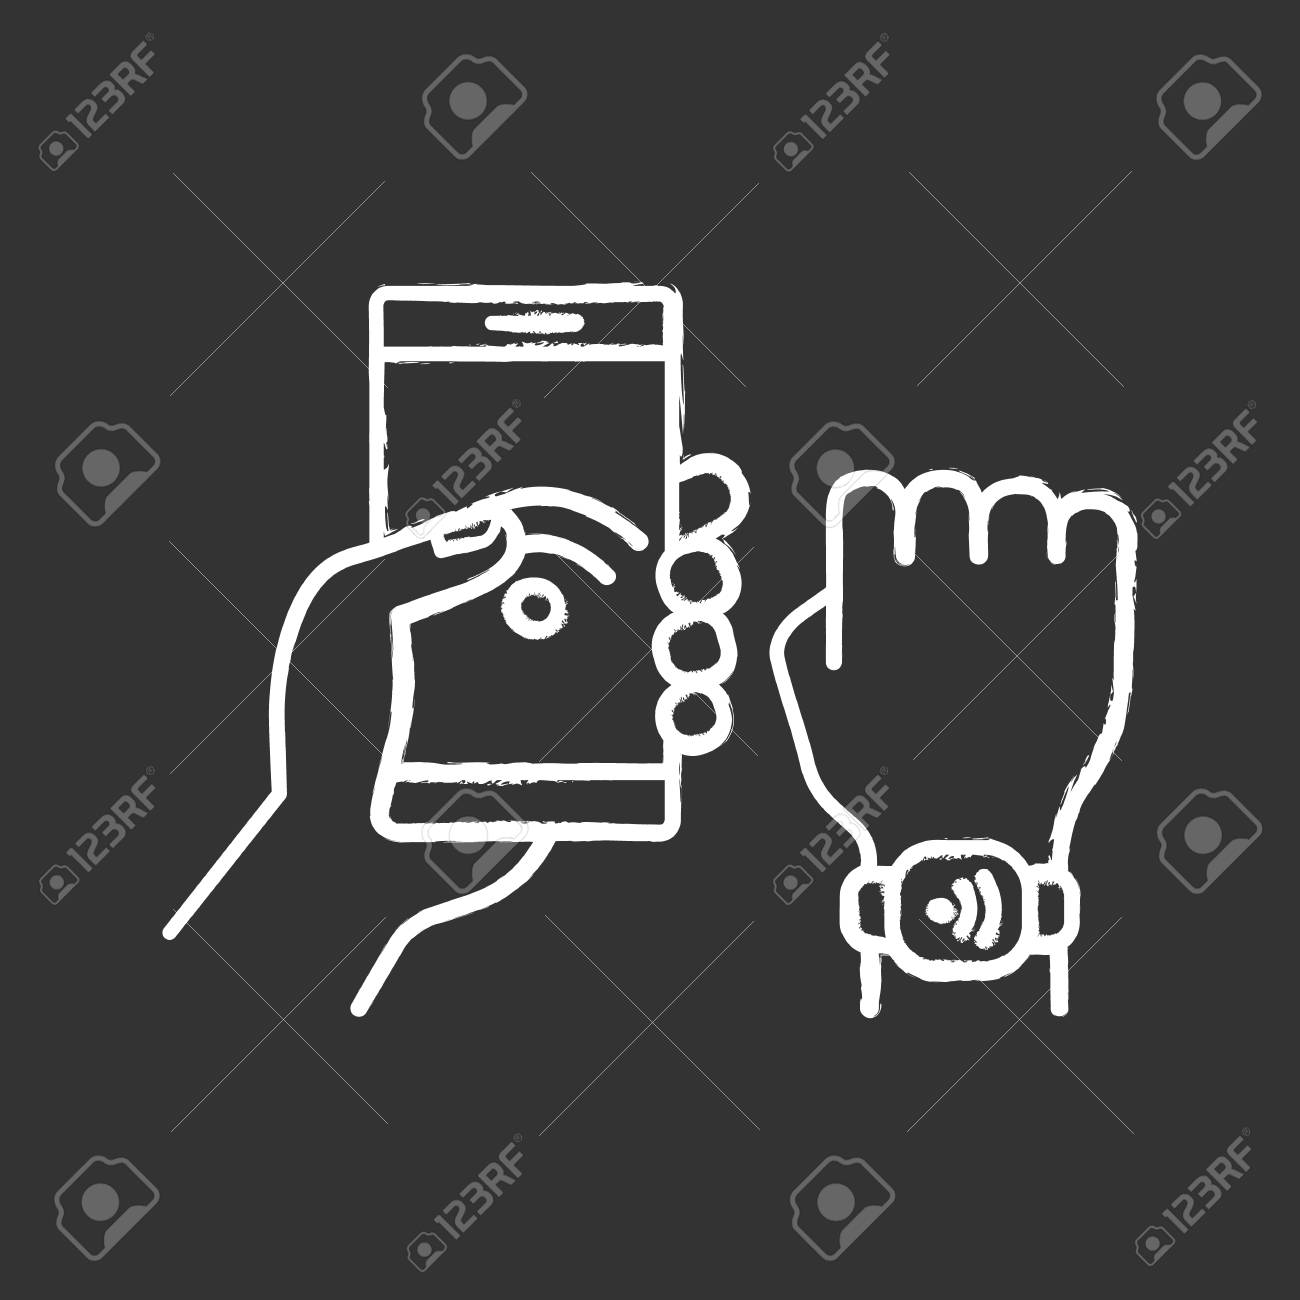 ebd5179c874b NFC phone synchronized with smartwatch. Near field communication.RFID  wristband. Isolated vector chalkboard illustration